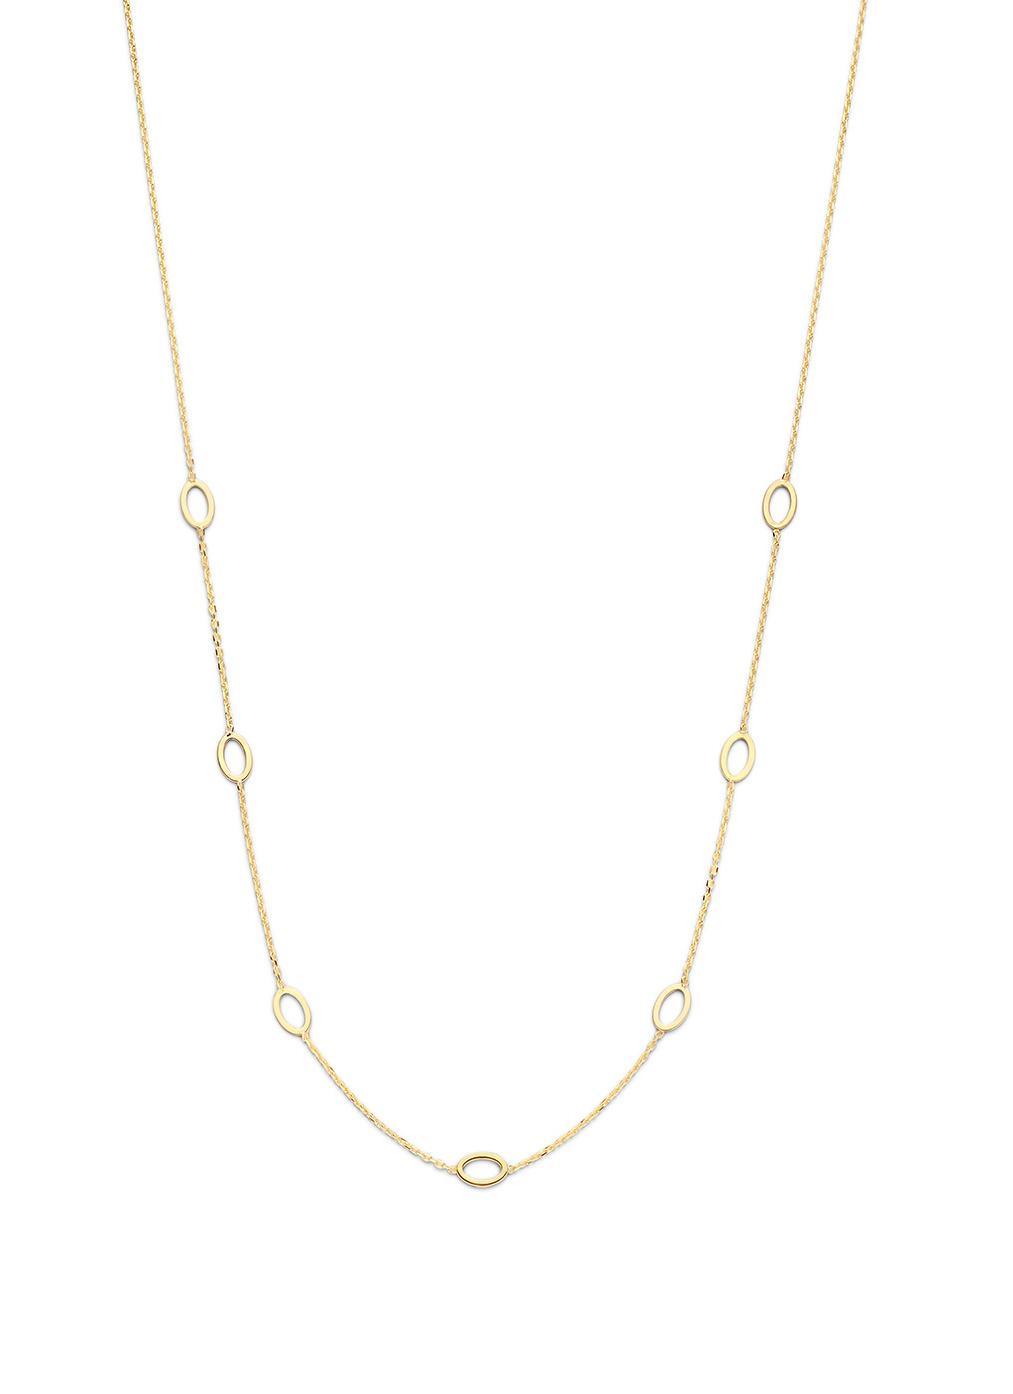 14 karaat geelgouden dames ketting - Jackie - Long Ovals Necklace-1